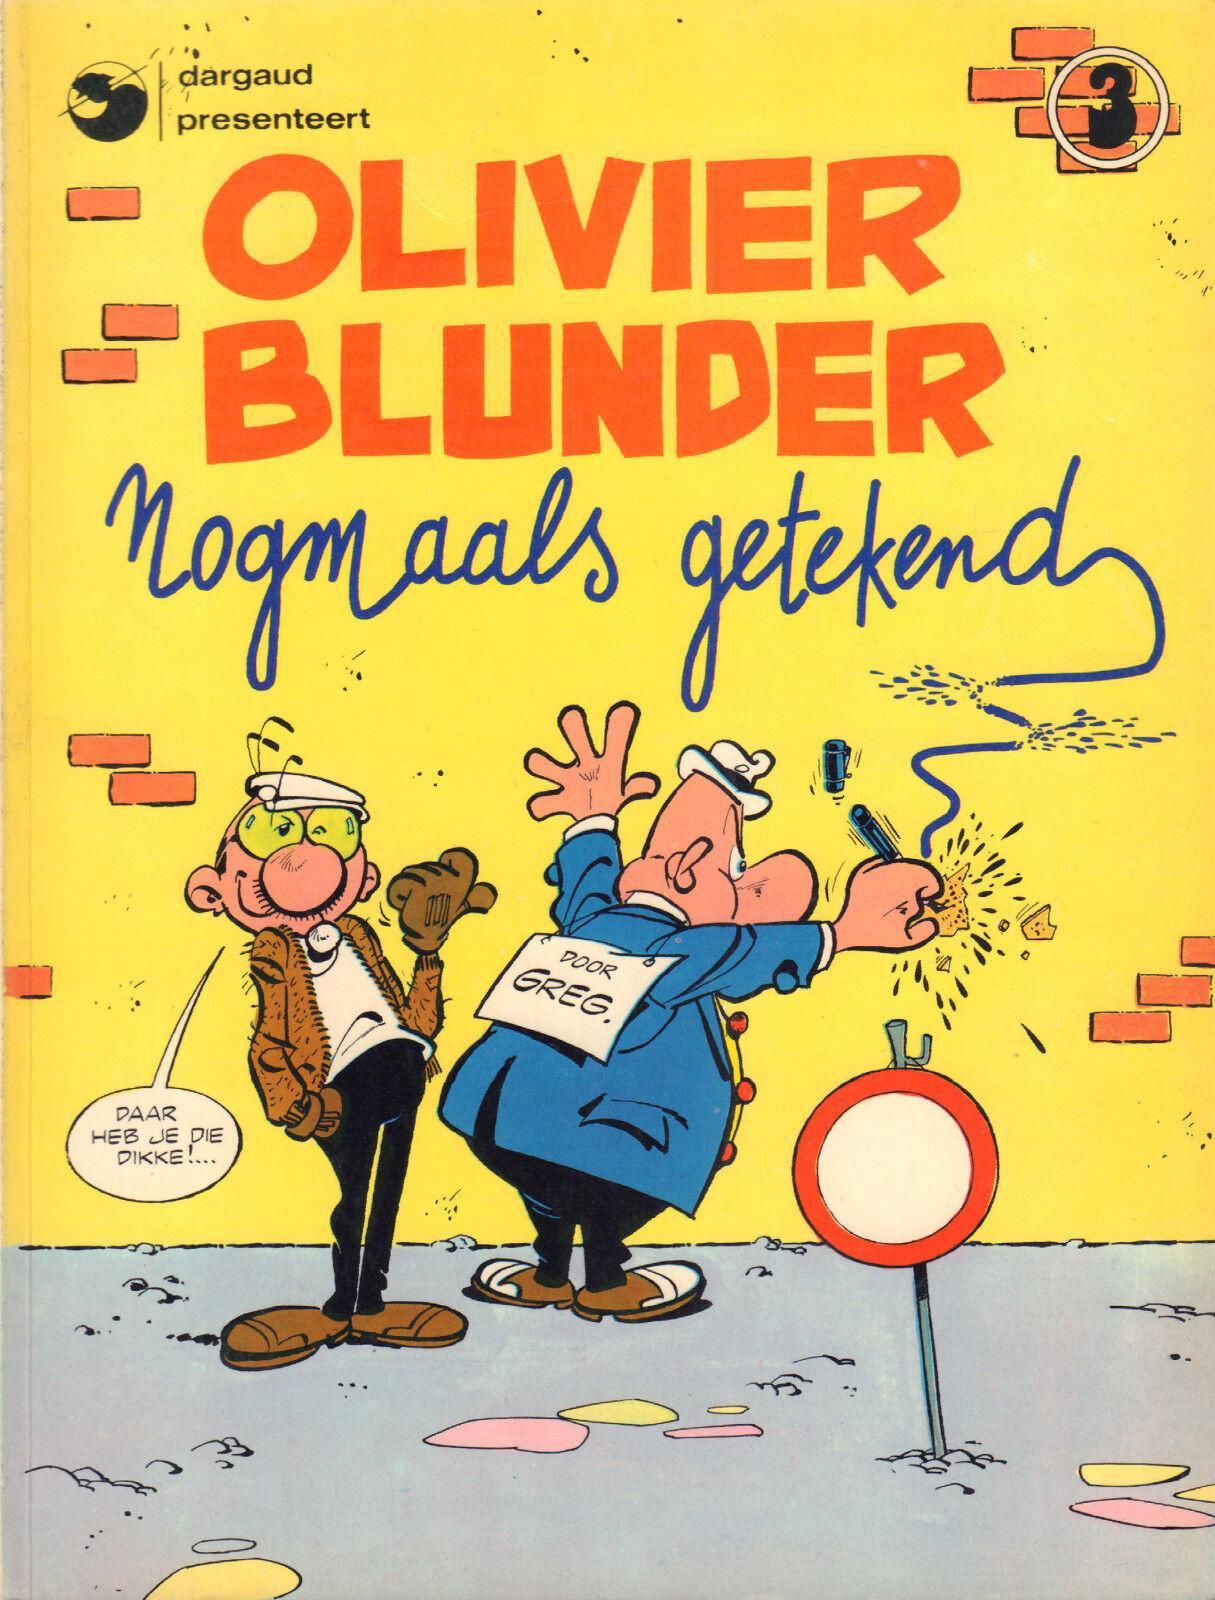 OLIVIER BLUNDER 03 - NOGMAALS GETEKEND